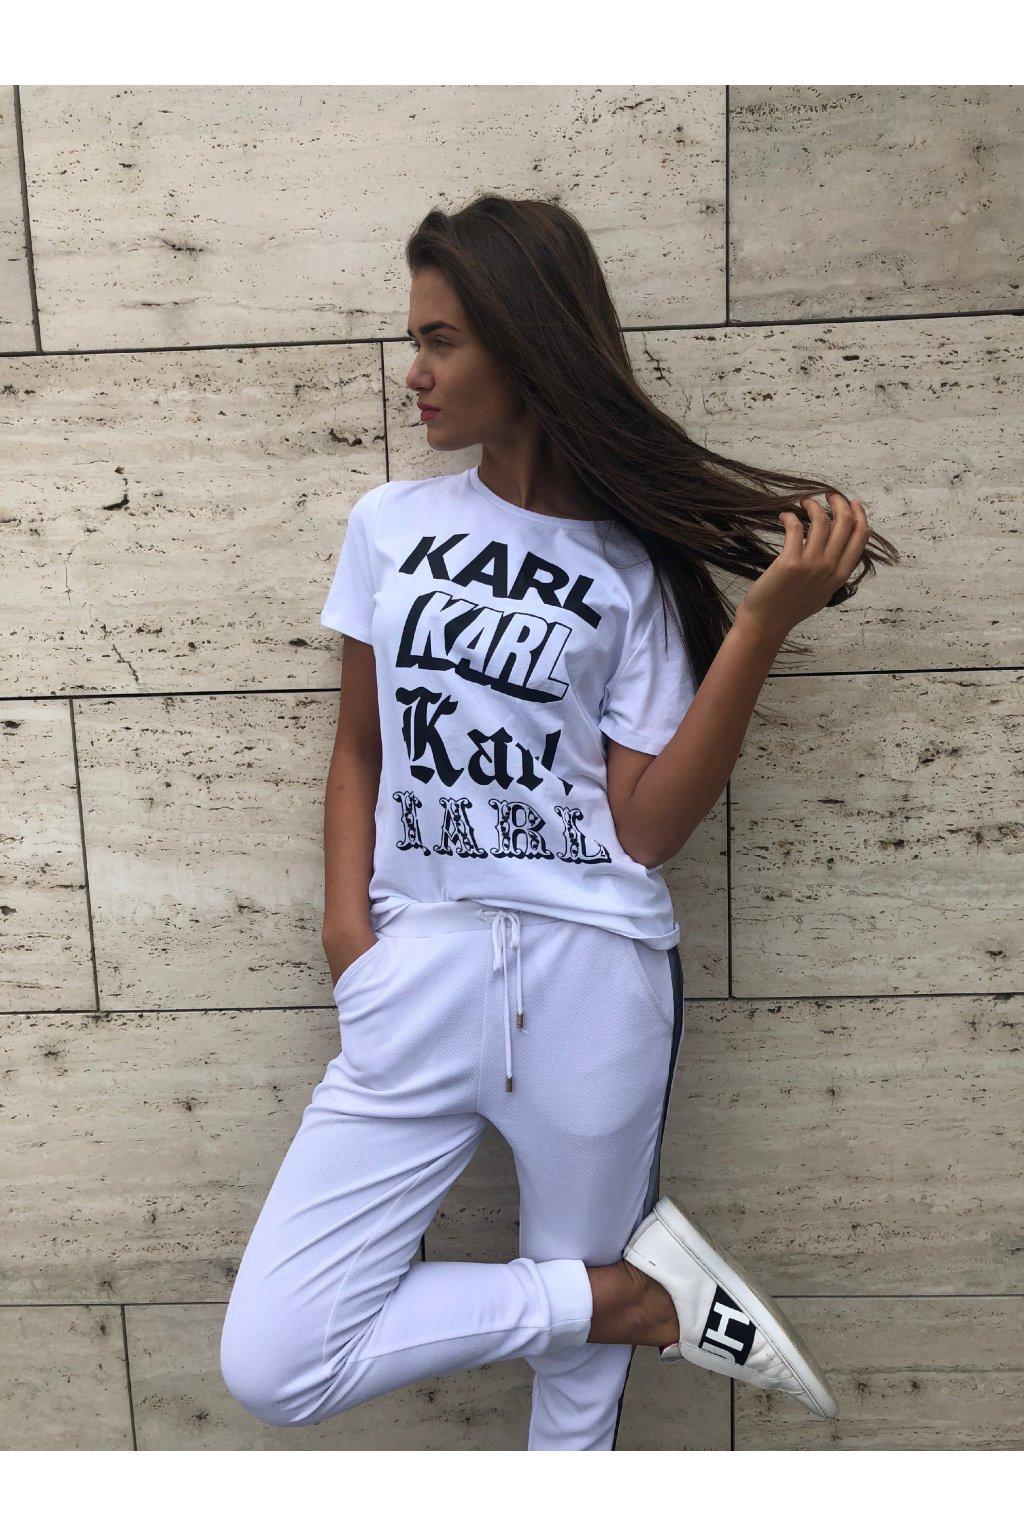 929e2ed67a4e Dámské tričko Karl Lagerfeld Karl Newspaper Tee White Velikost  L